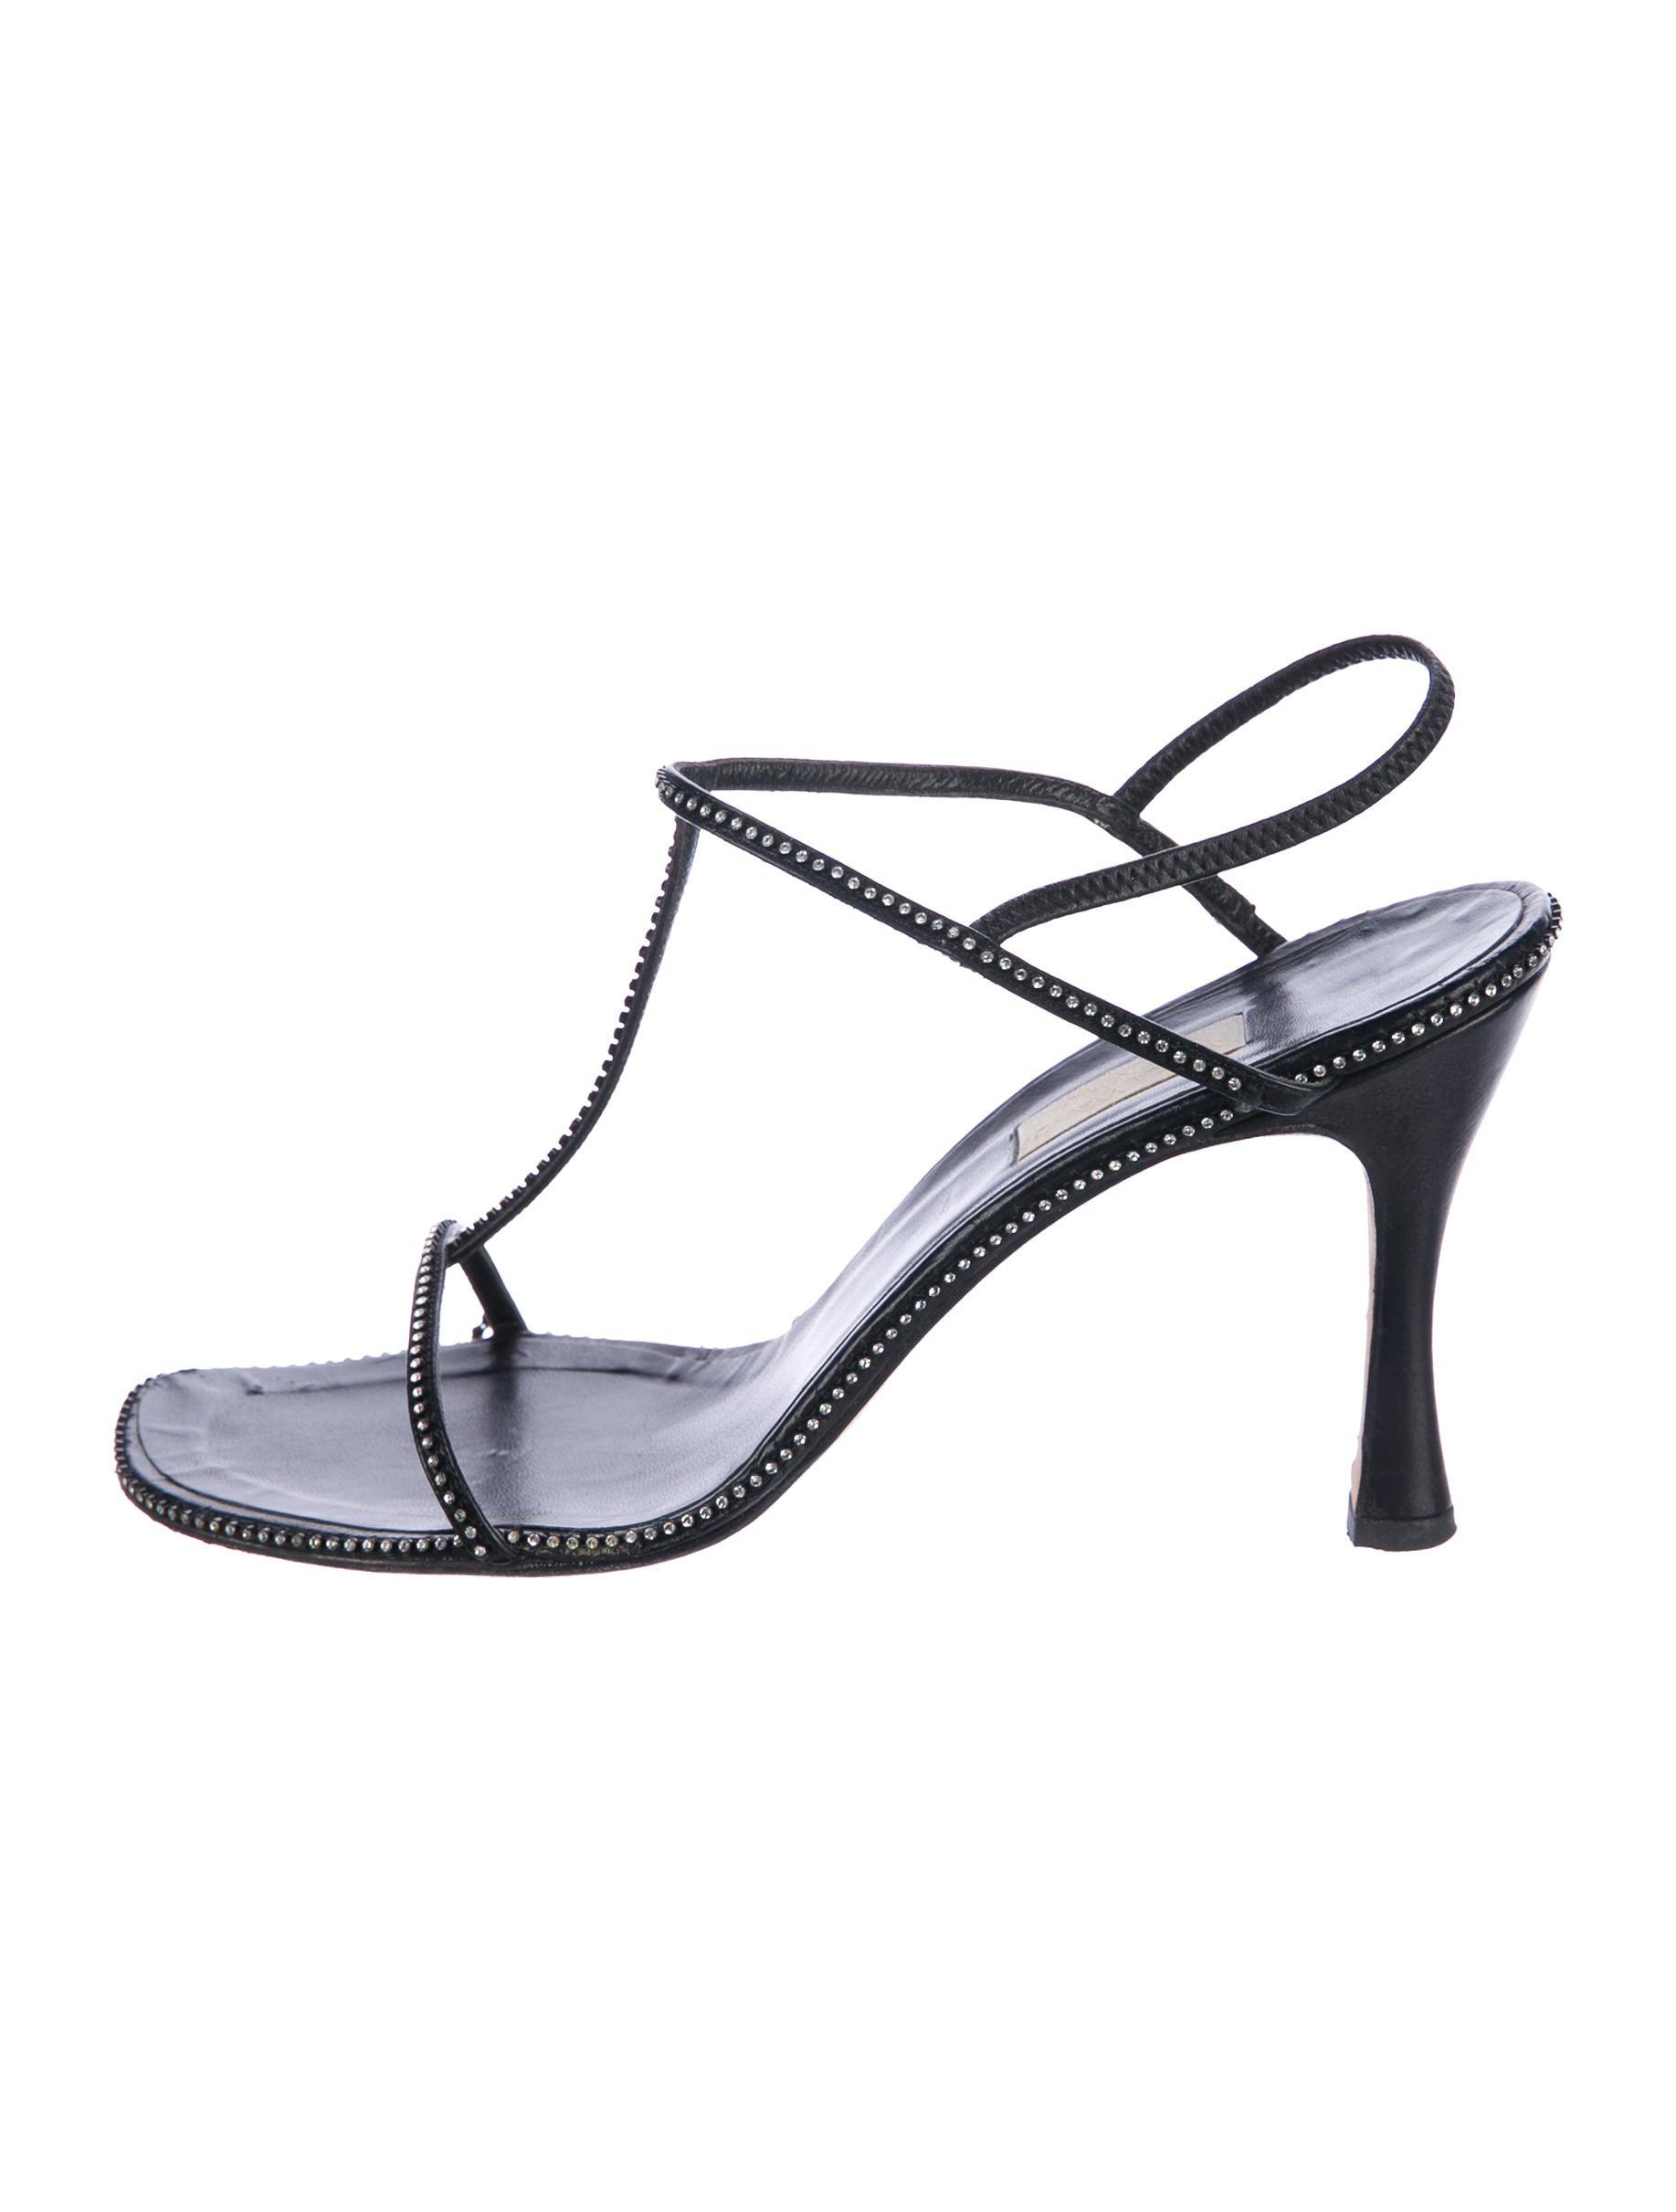 Vera Wang Rhinestone Accented Slingback Sandals discount best 7d56xcslrK